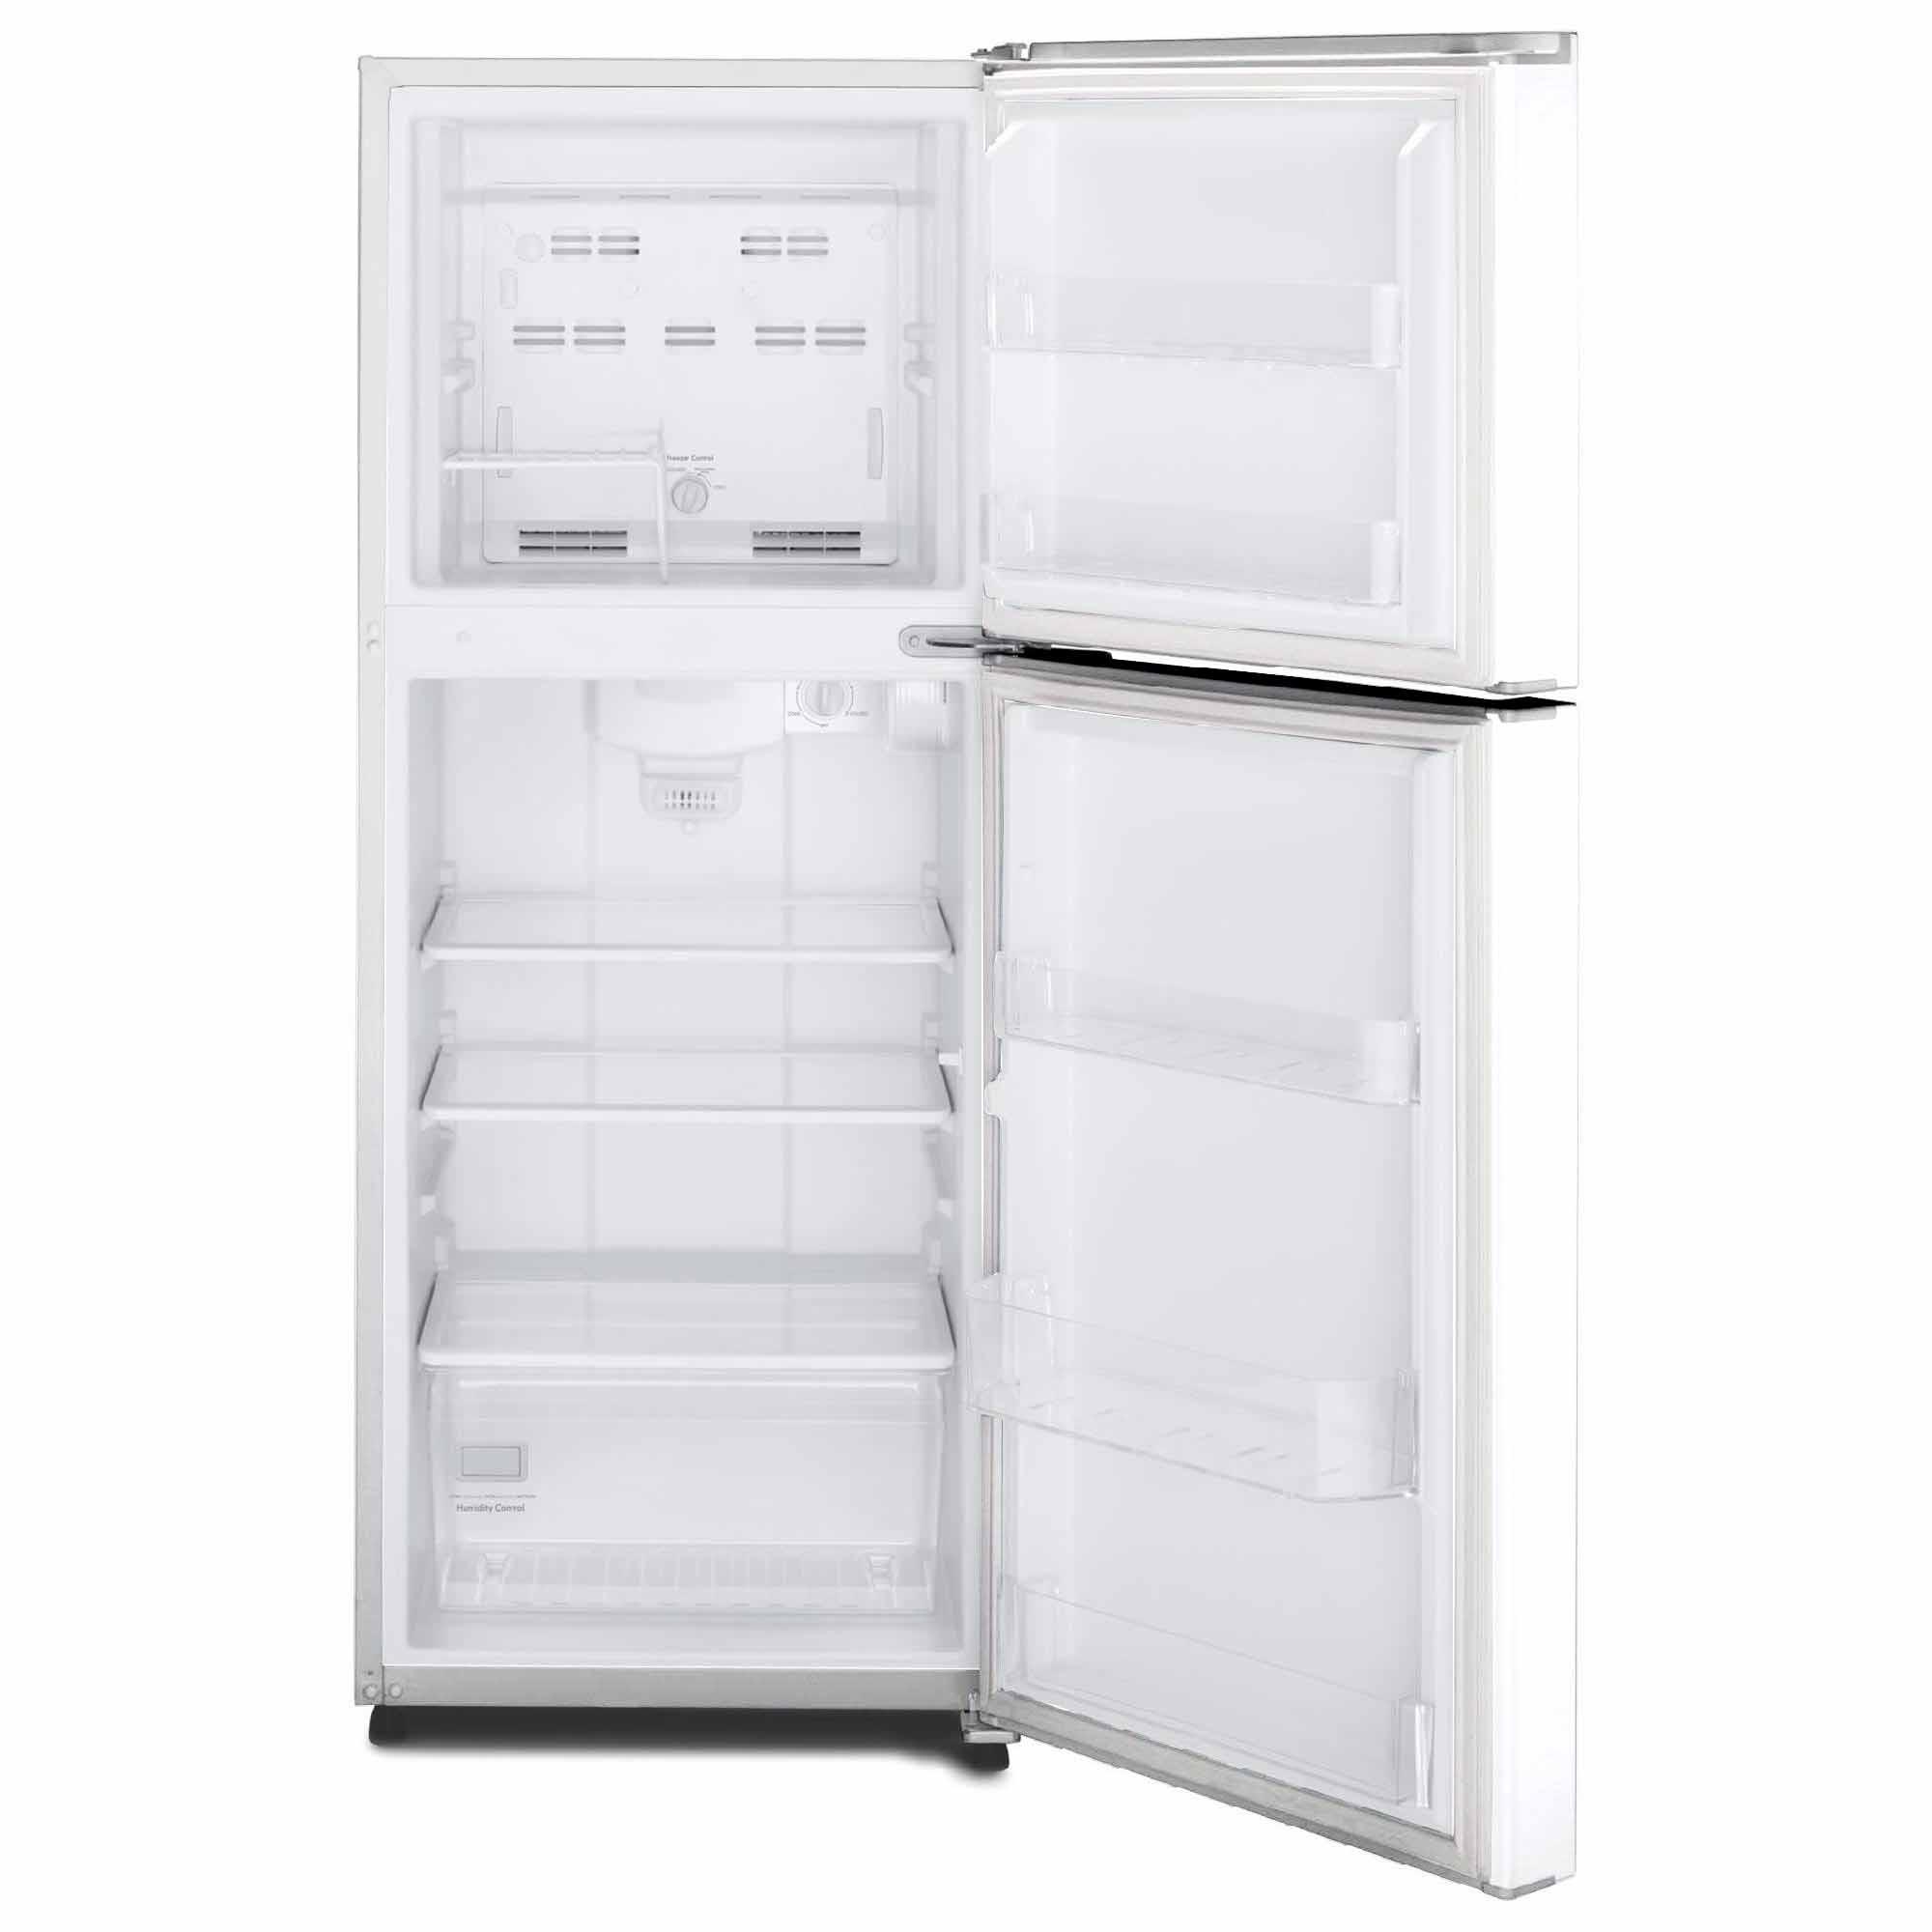 Kenmore 76392 10.7 cu. ft. Top-Freezer Refrigerator w/ Humidity-Controlled Crisper - White